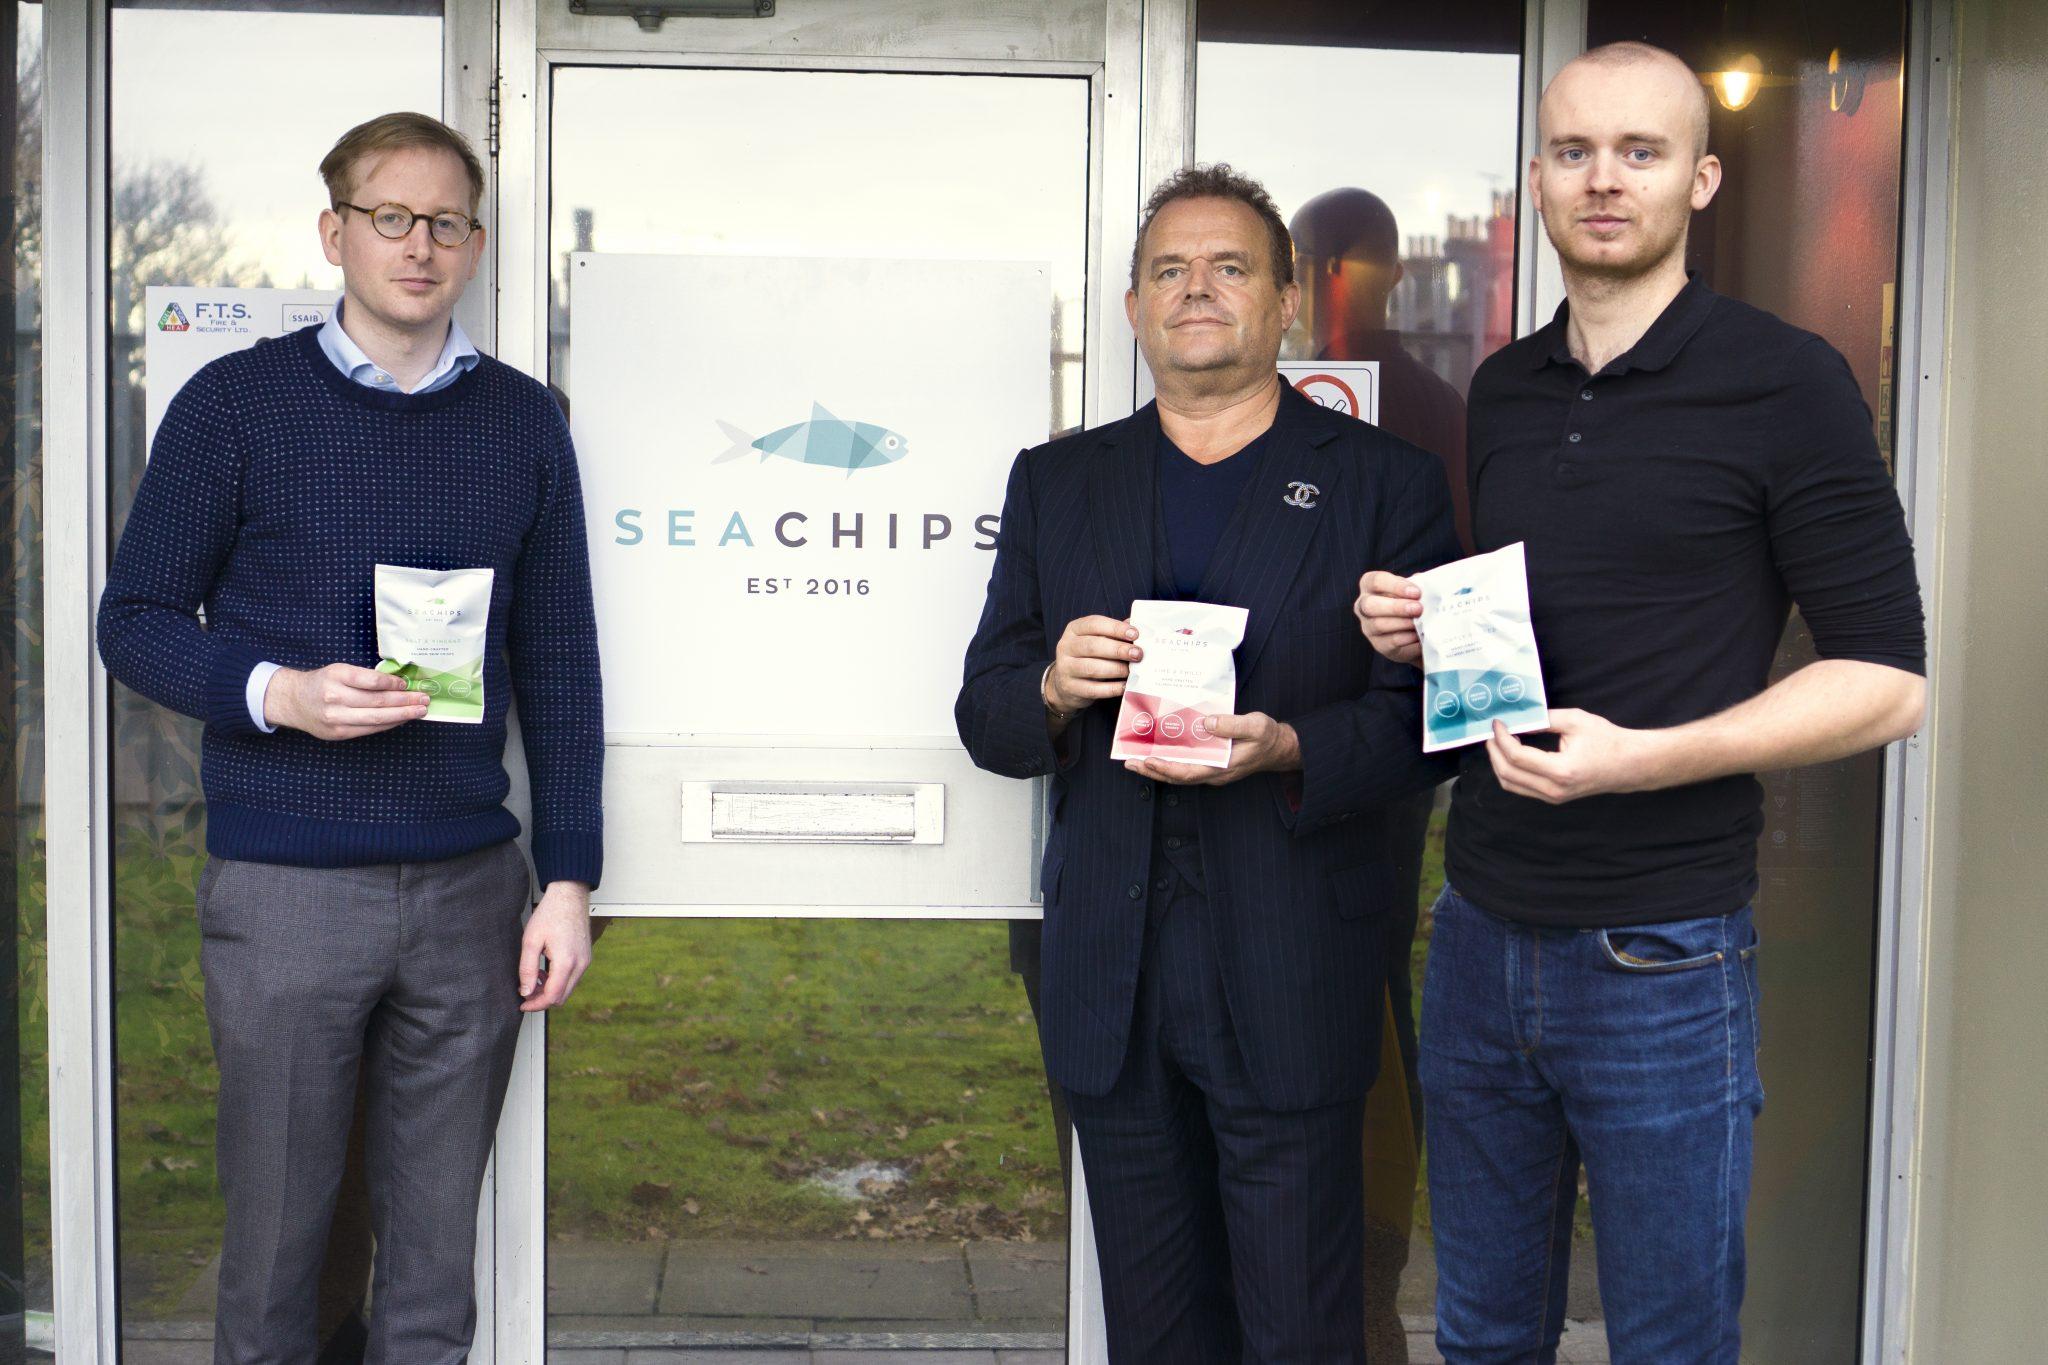 Dom Smith, Jonathan MacKnight, Daniel Pawson – Sea Chips new factory